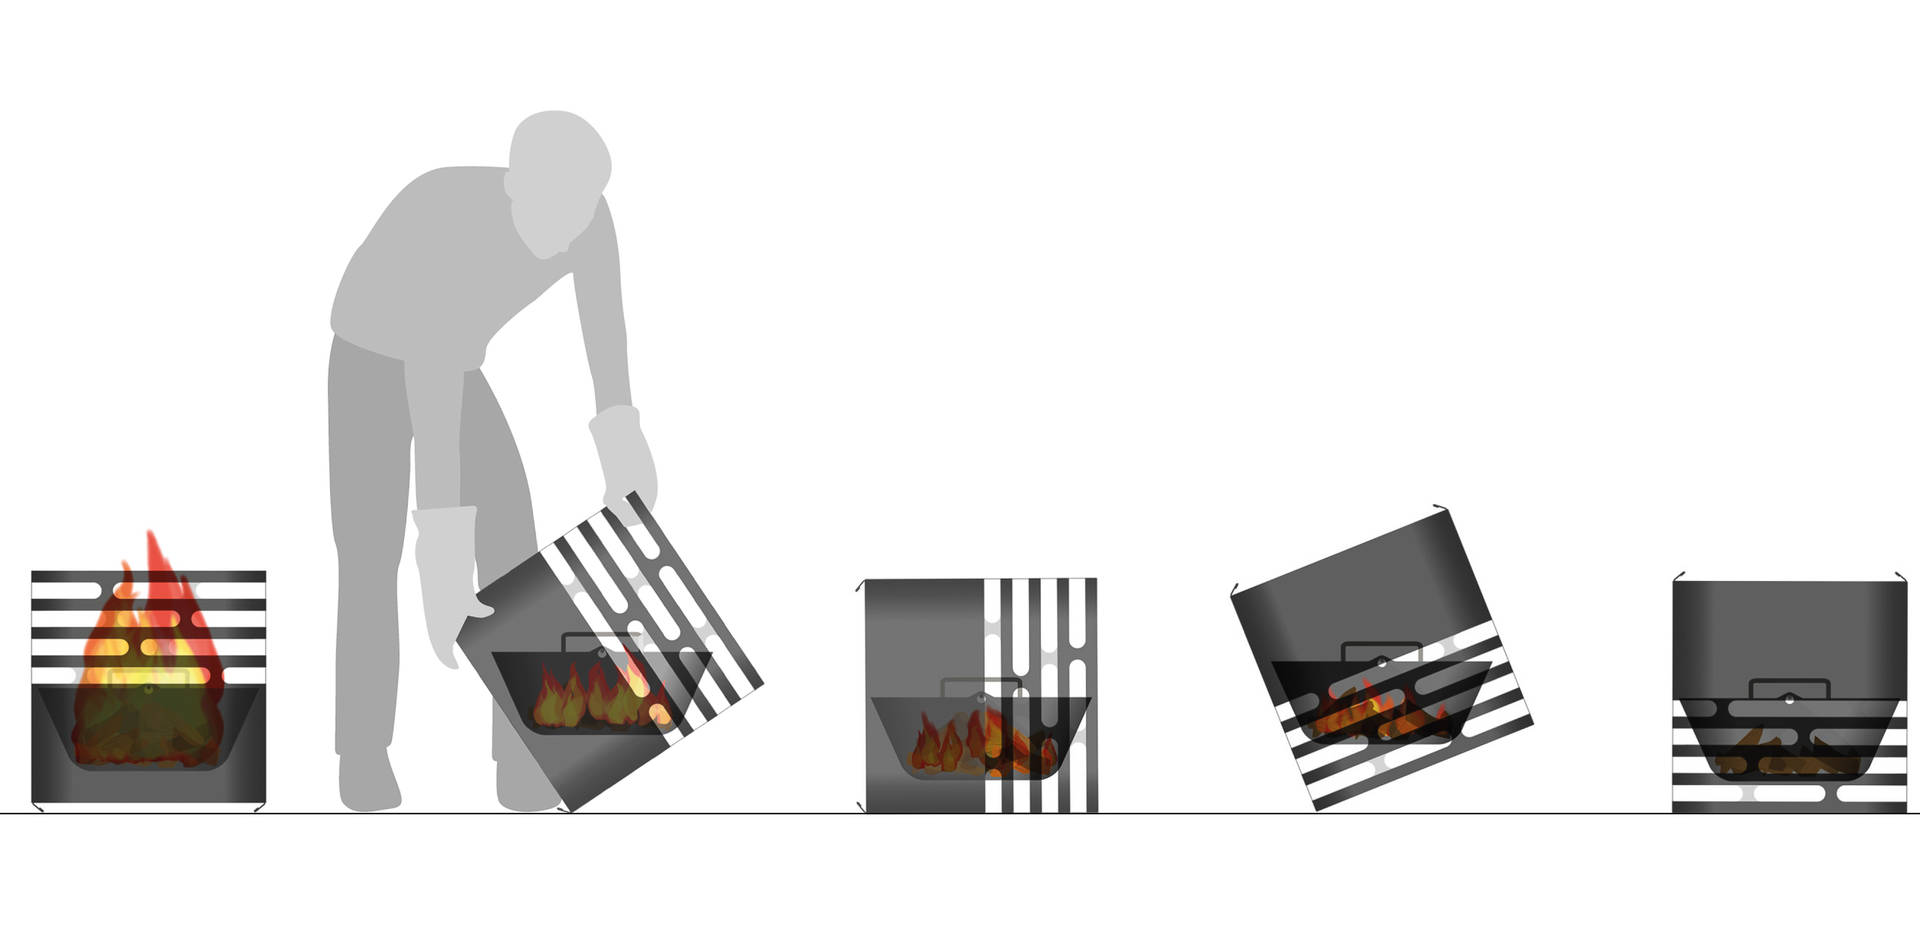 gril hofats cube